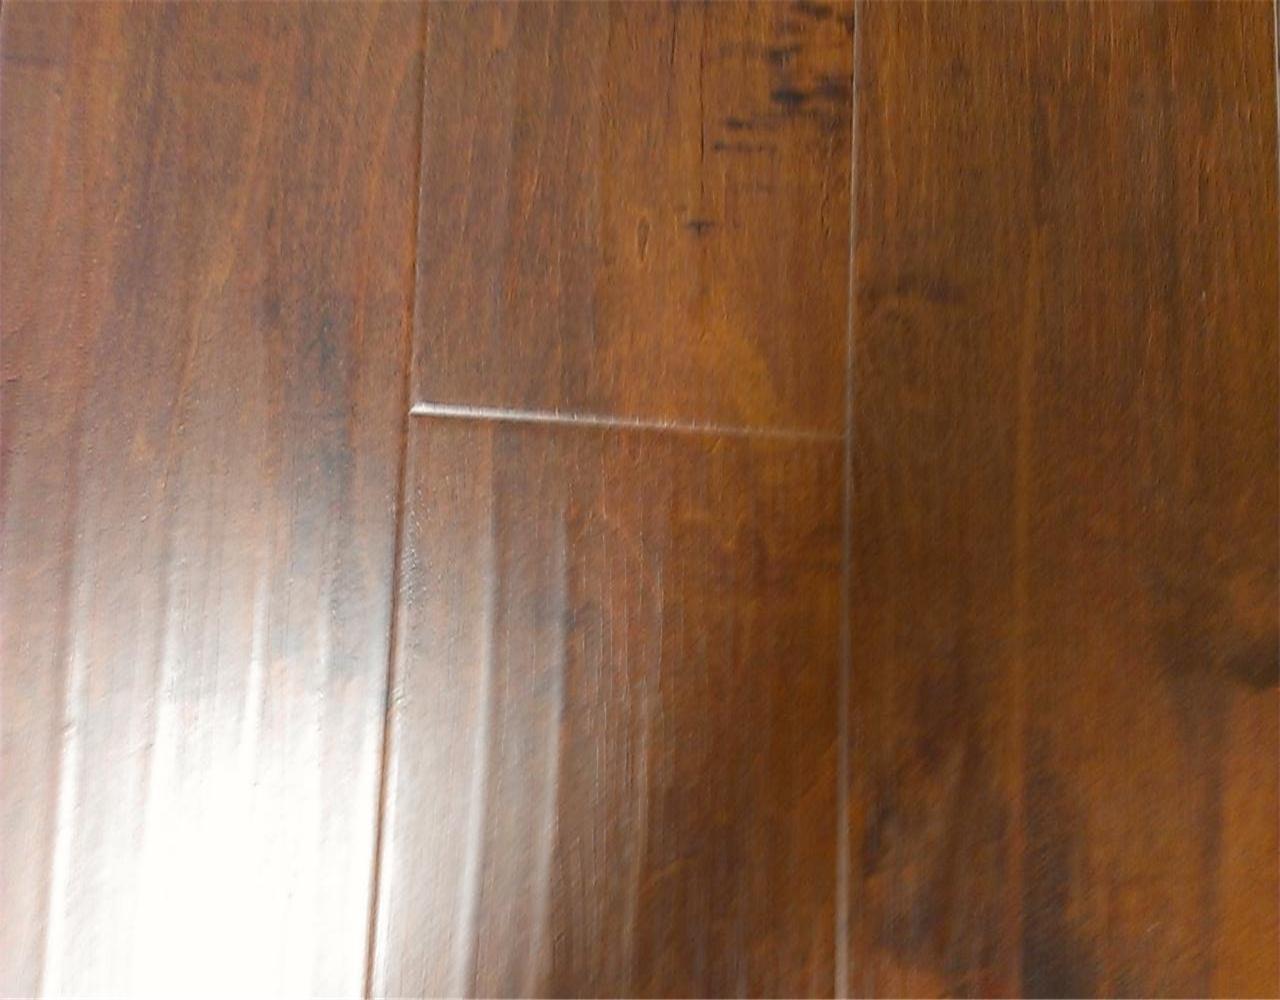 12mm distressed hand scraped amber birch laminate floor. Black Bedroom Furniture Sets. Home Design Ideas